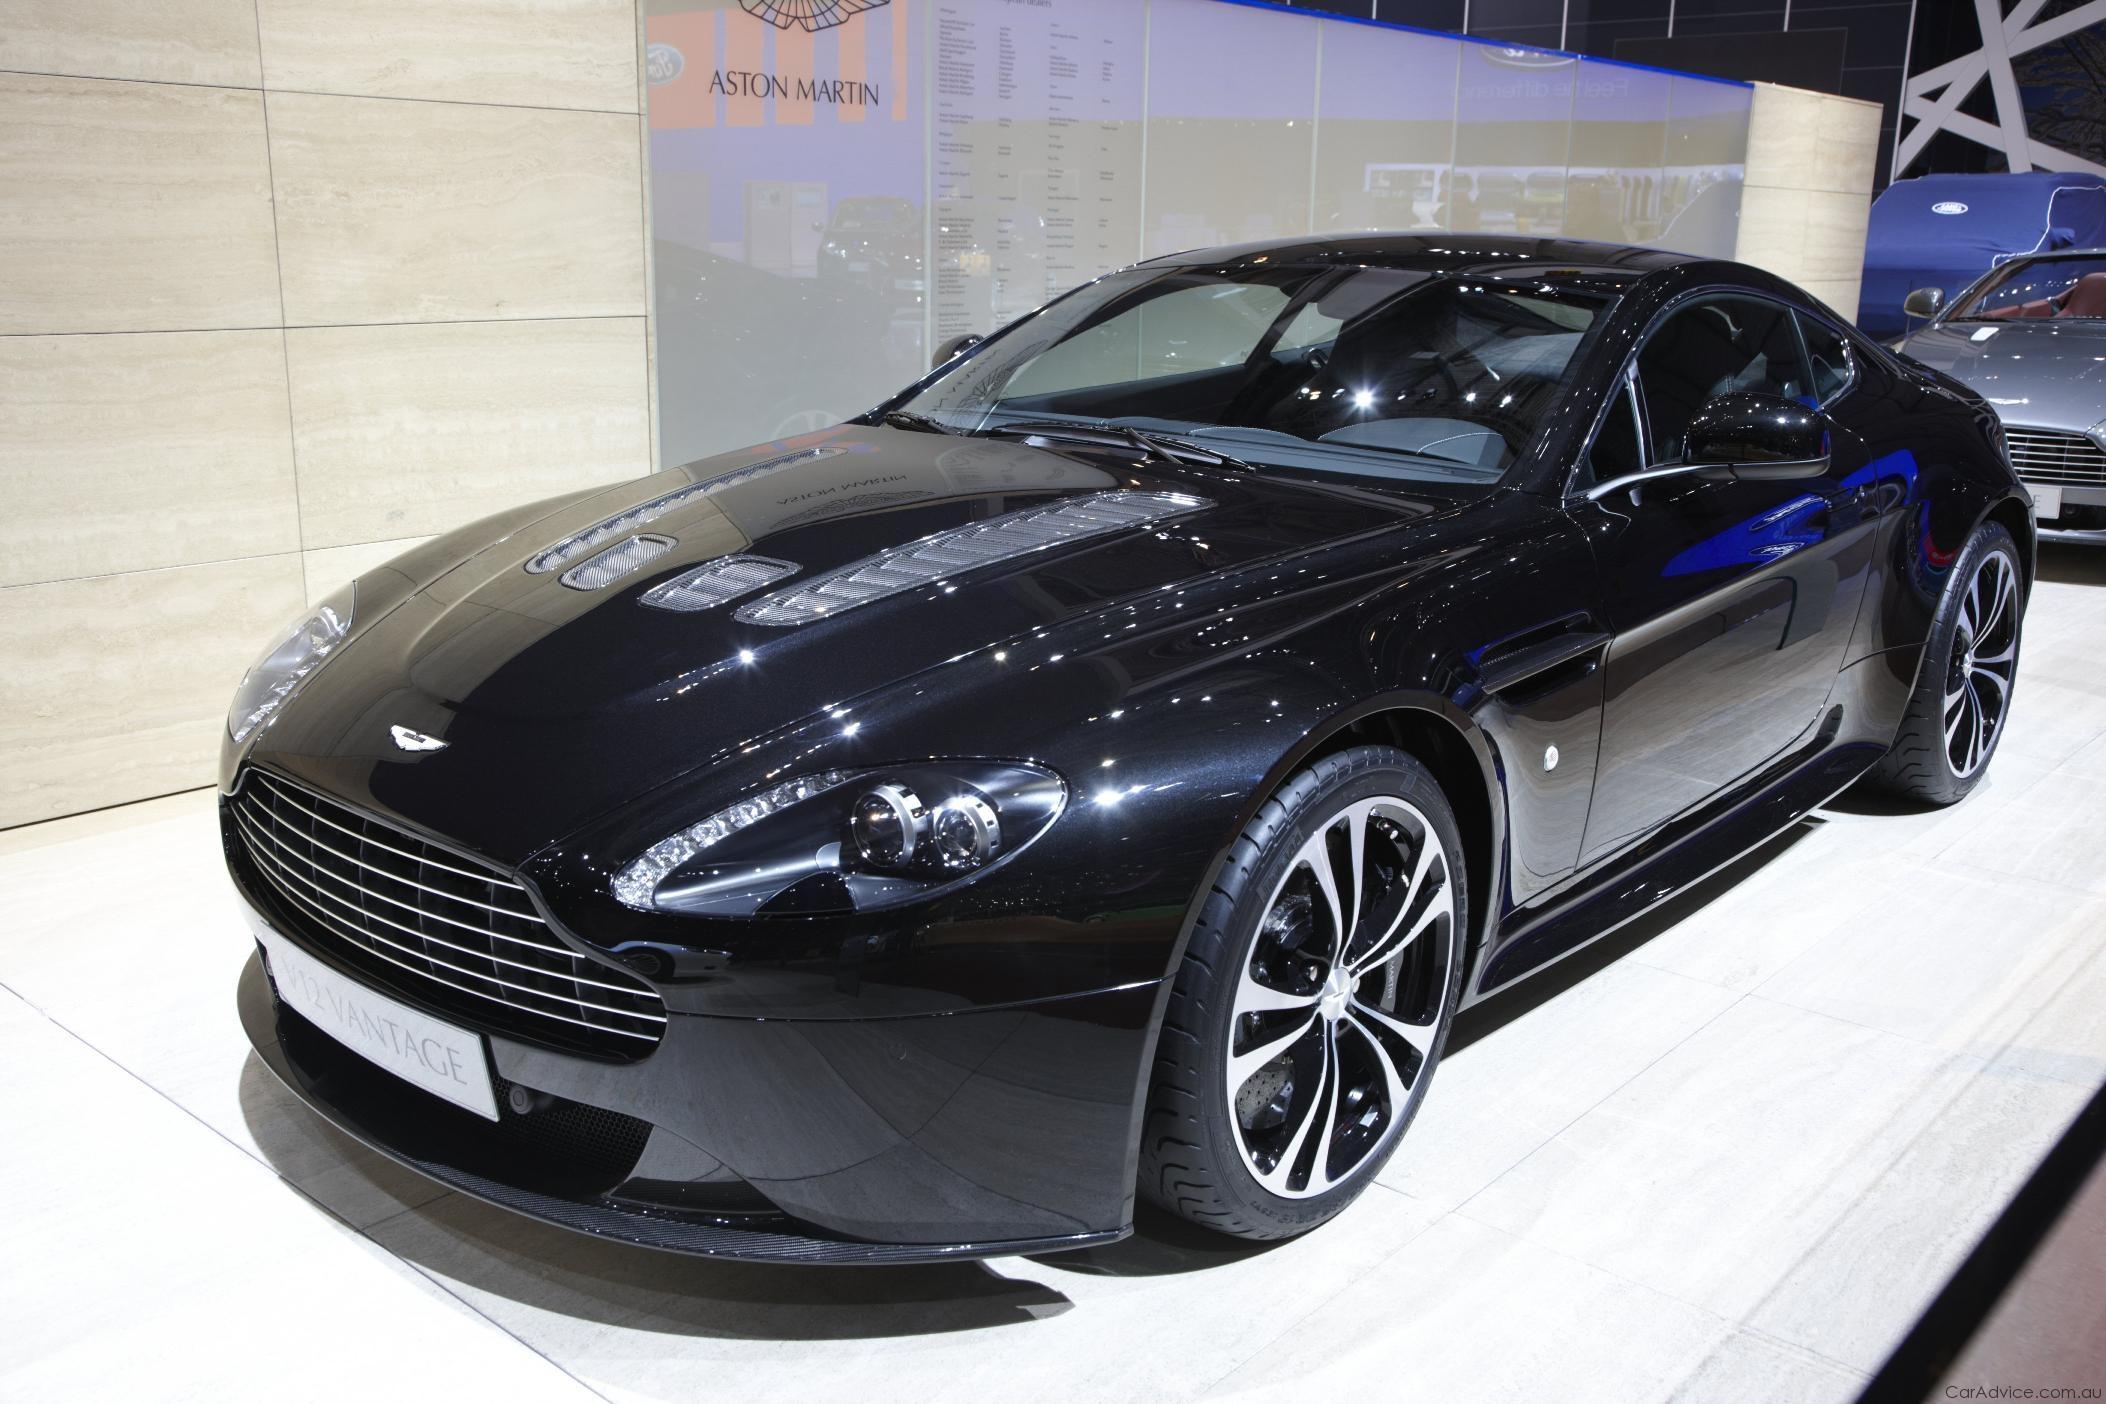 Aston Martin V12 Vantage Carbon Black Edition Geneva 2010 Caradvice